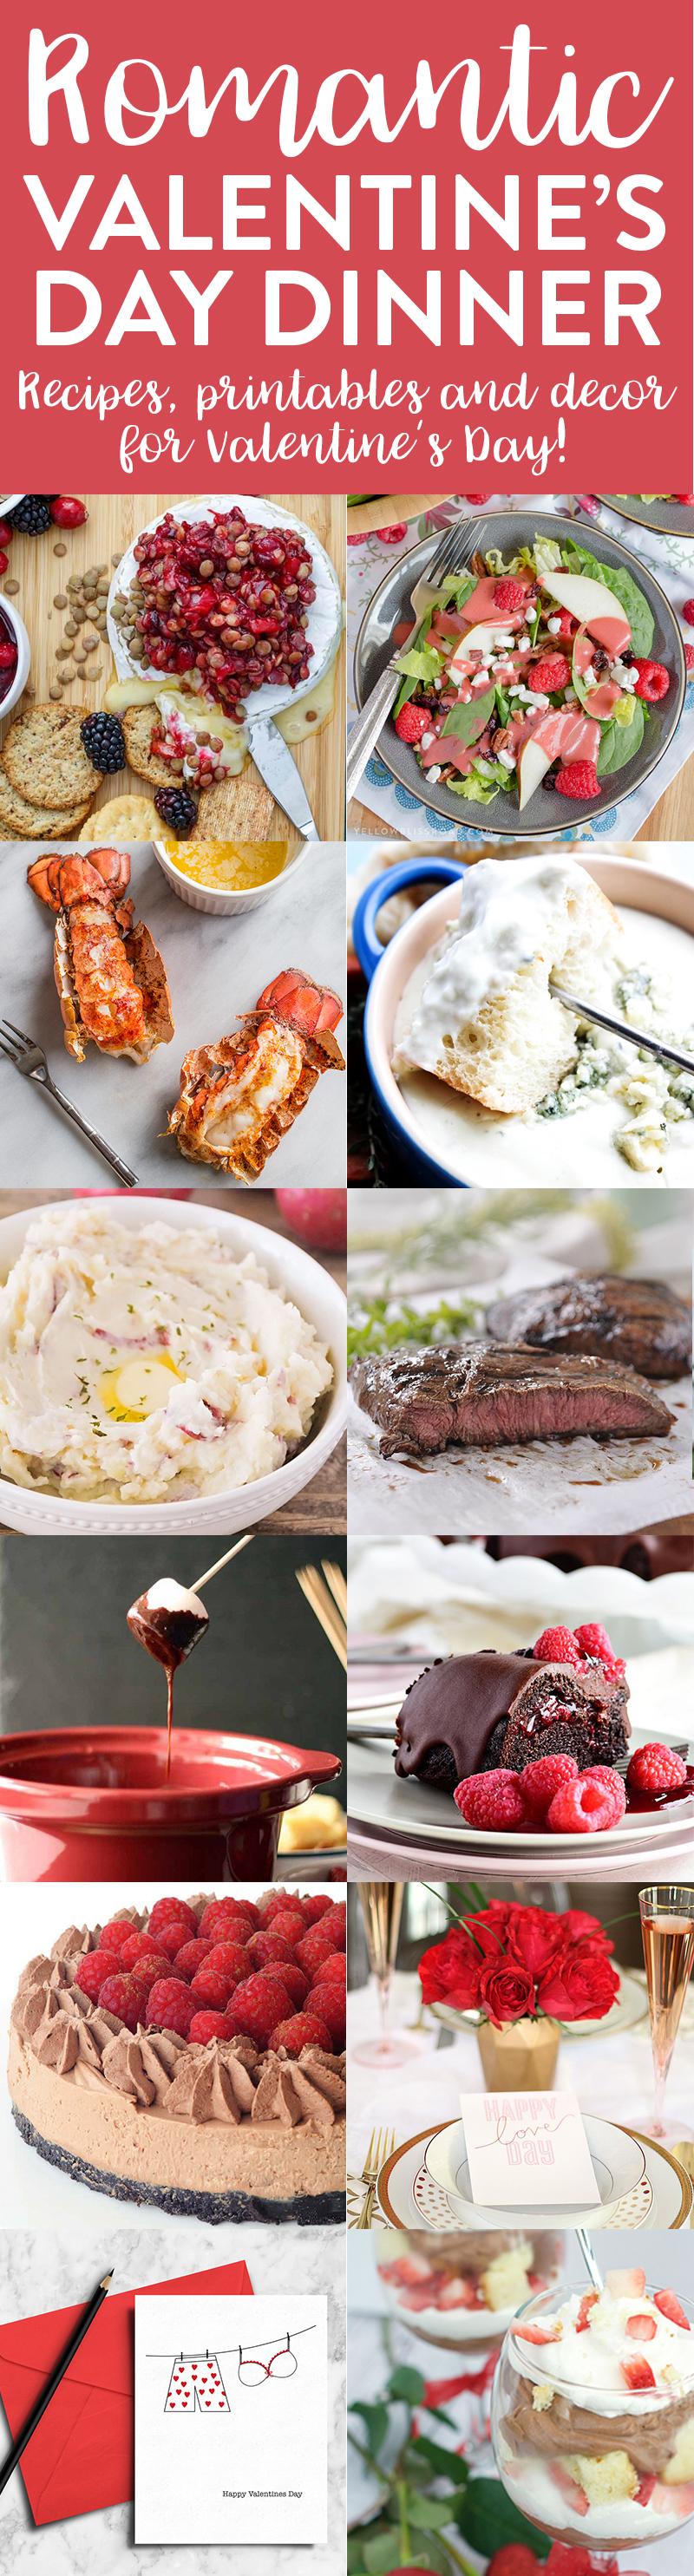 Romantic Valentines Day Dinner Ideas